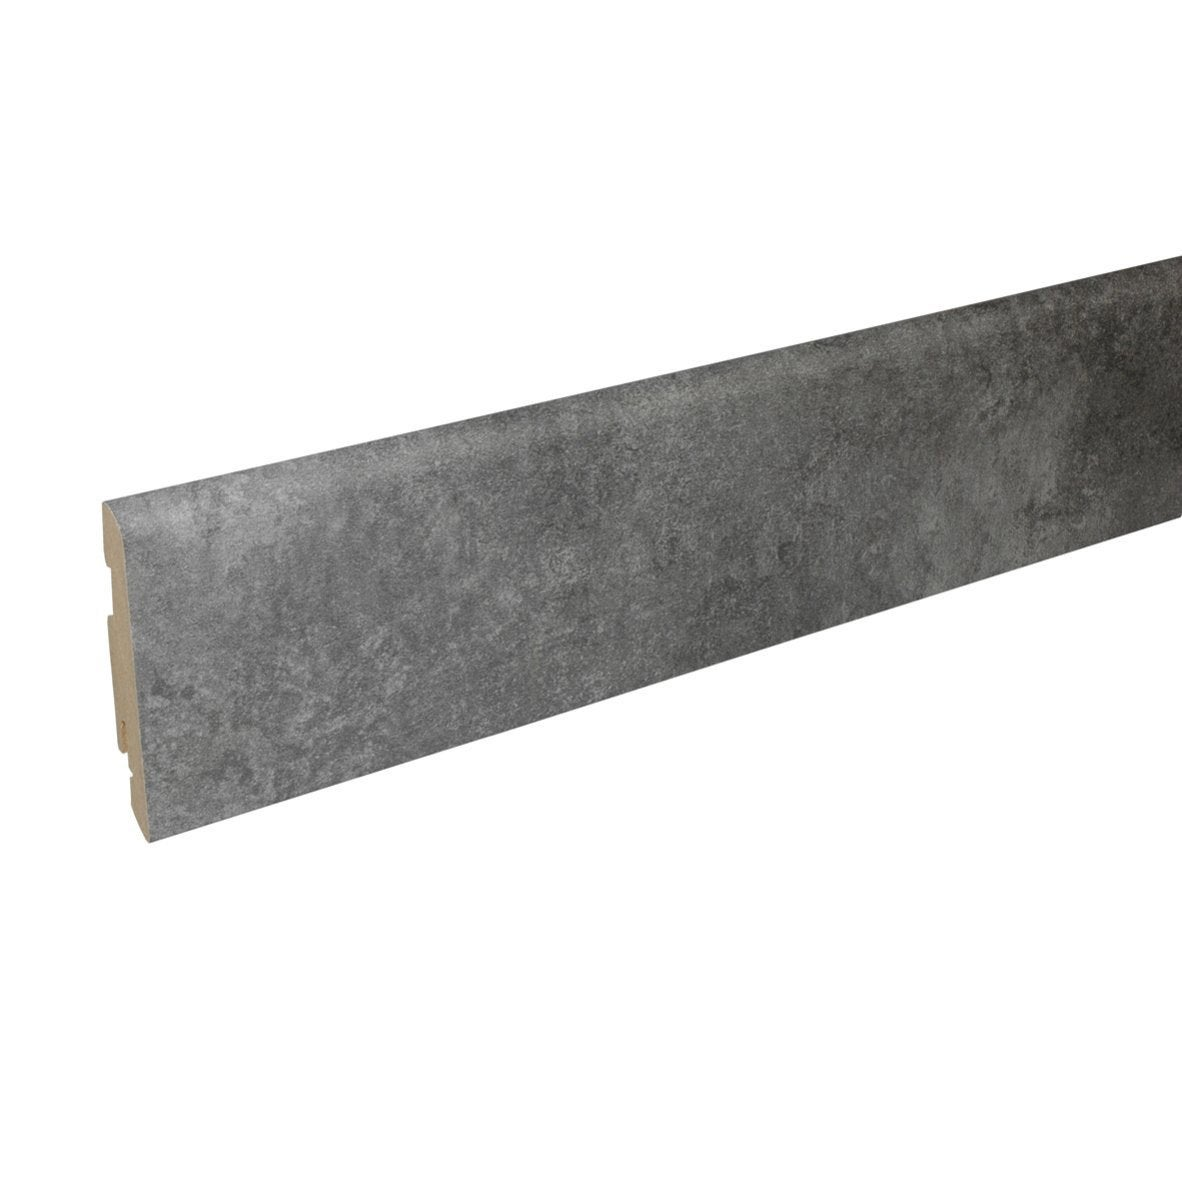 plinthe sol stratifi effet b ton cendr cm x x mm leroy merlin. Black Bedroom Furniture Sets. Home Design Ideas